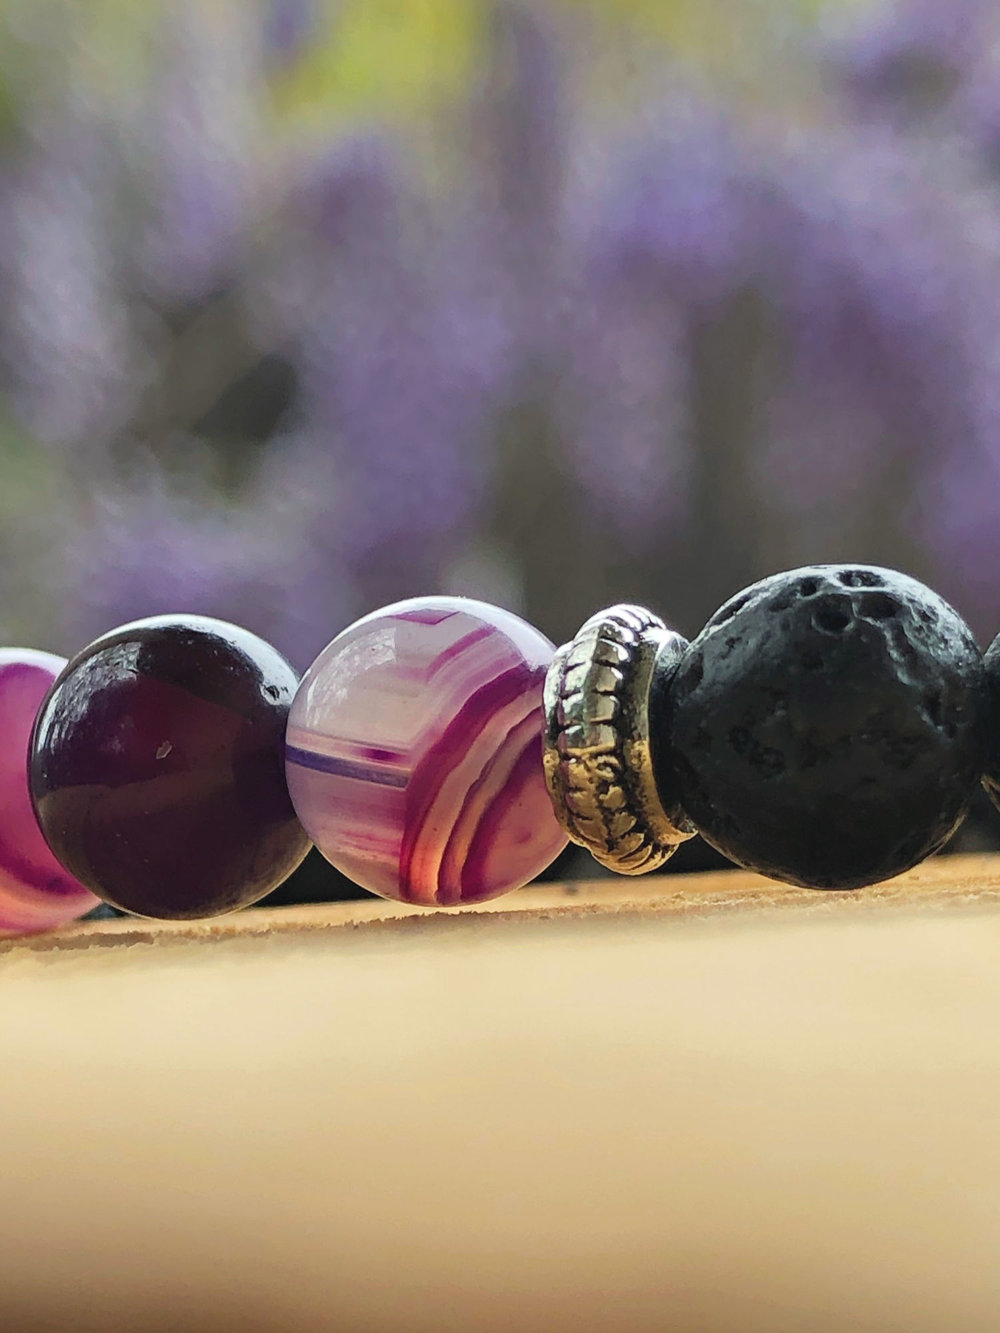 purple onyx and lava stone.jpg